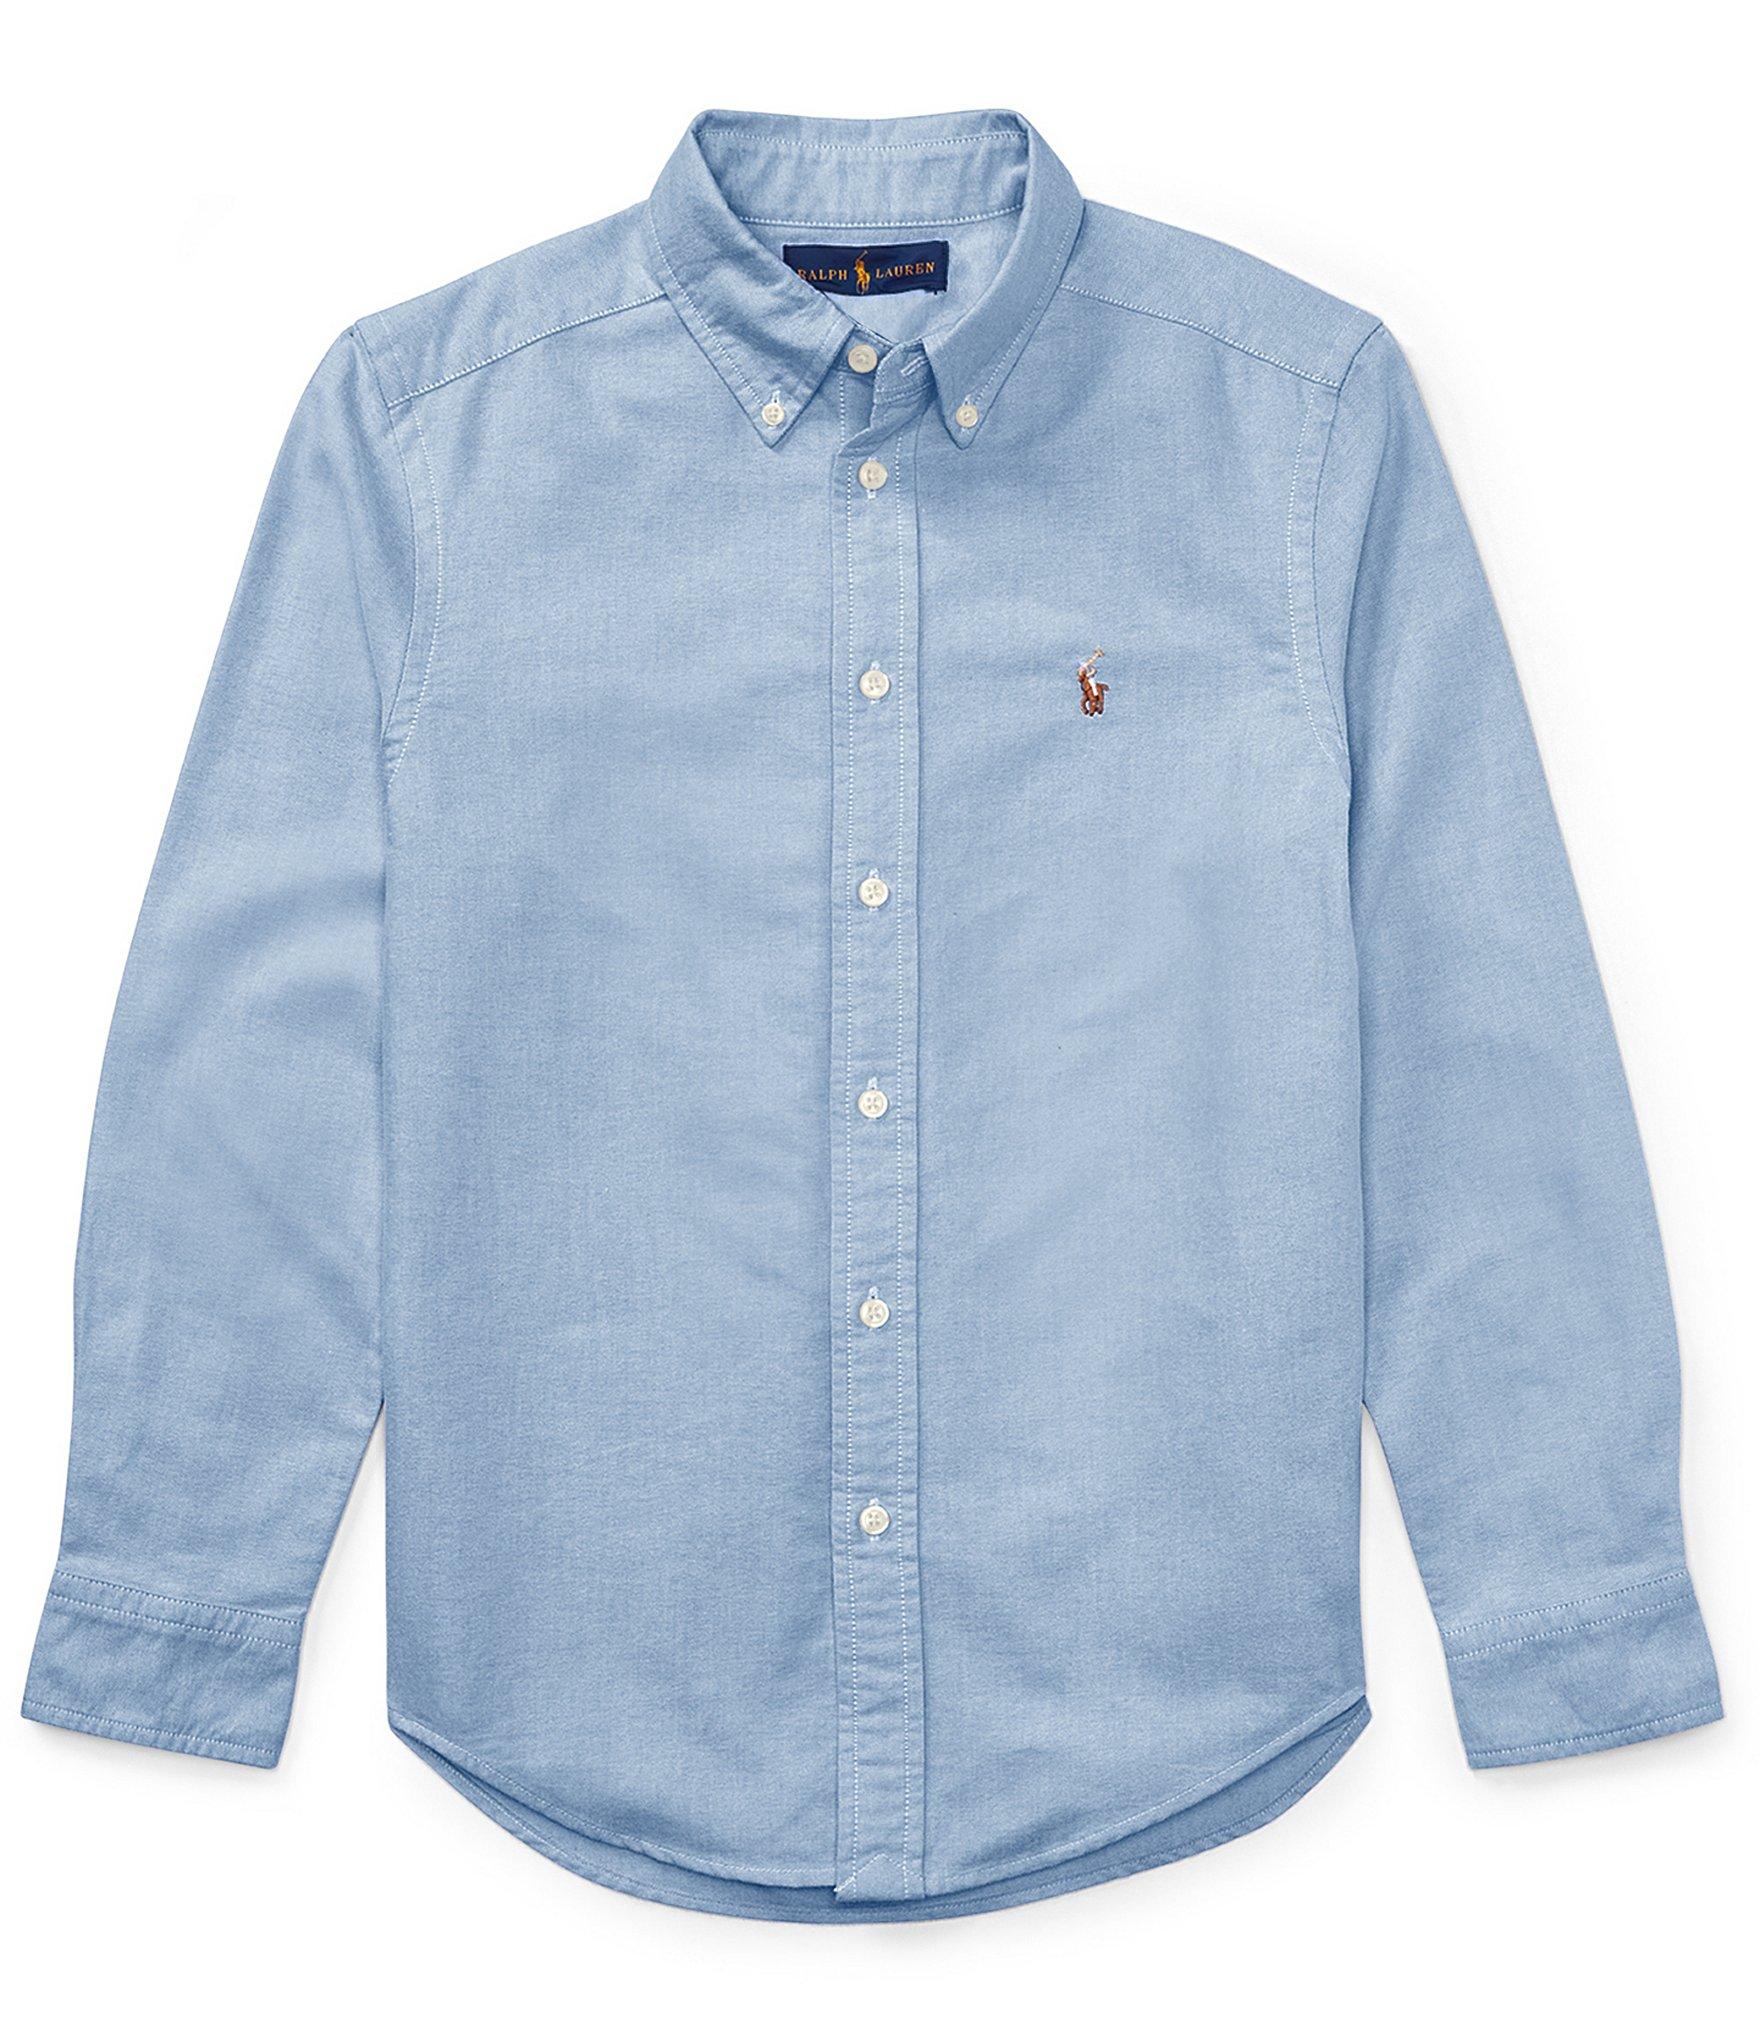 Boys Button Front Dress Shirts Dillards